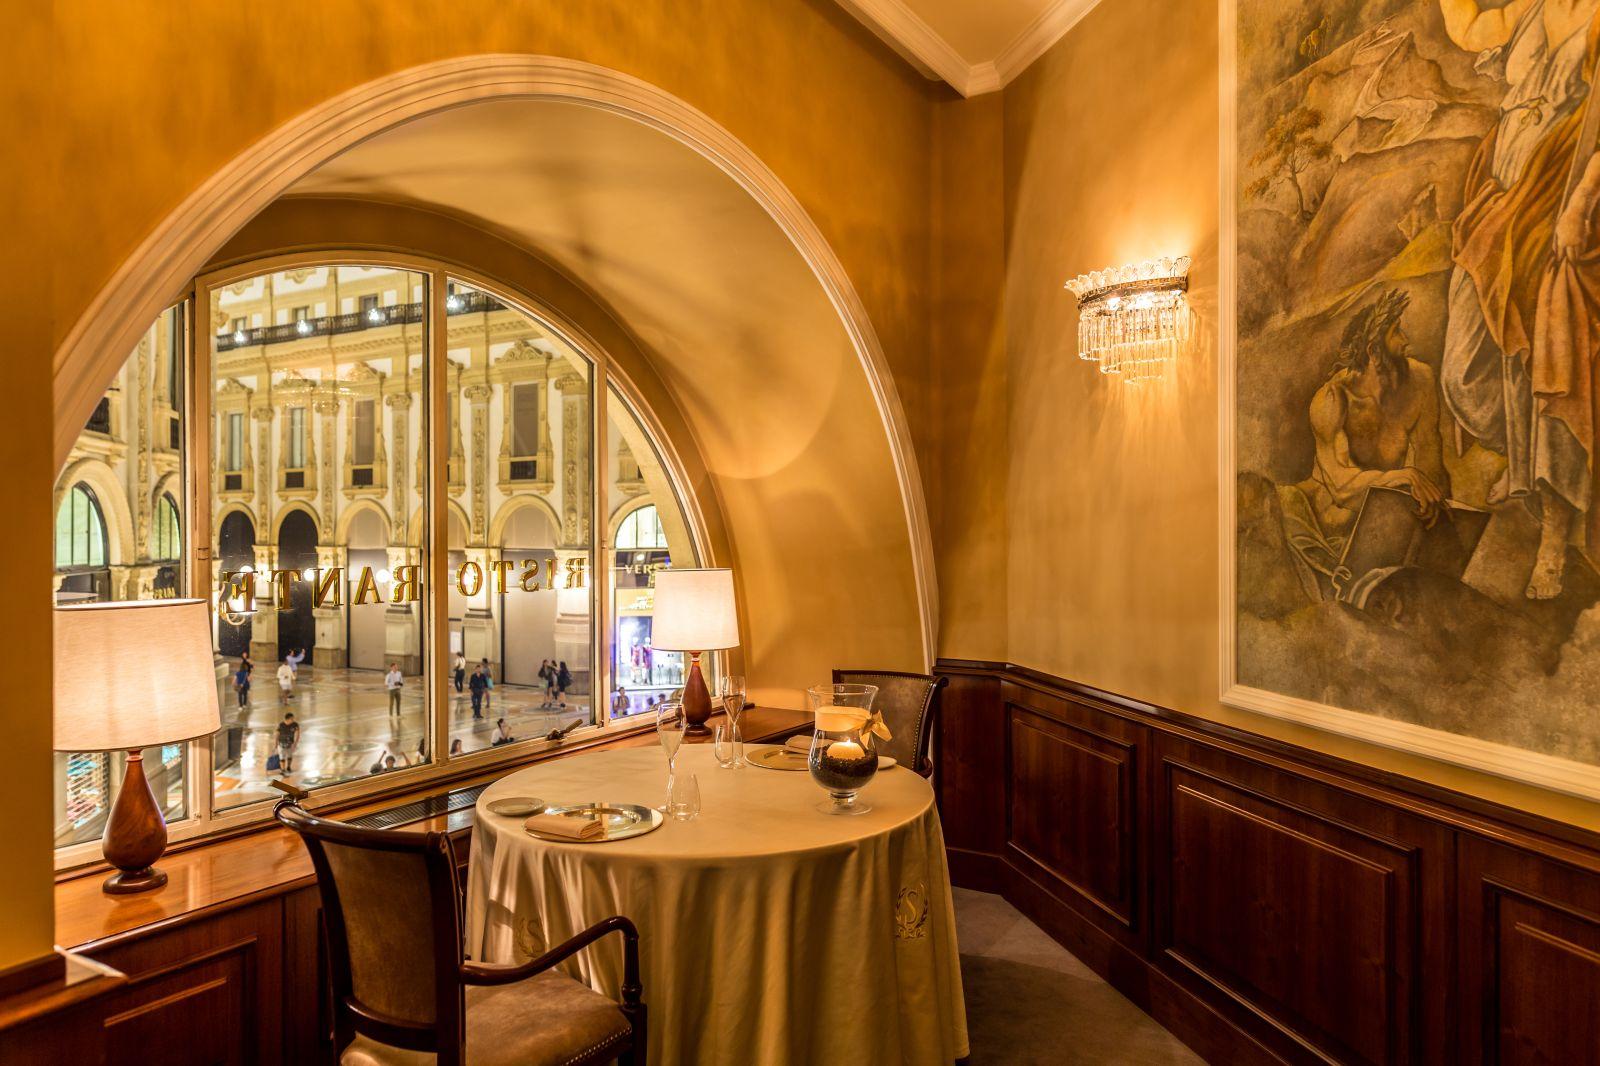 Ristorante savini ristorante for Kos milano ristorante